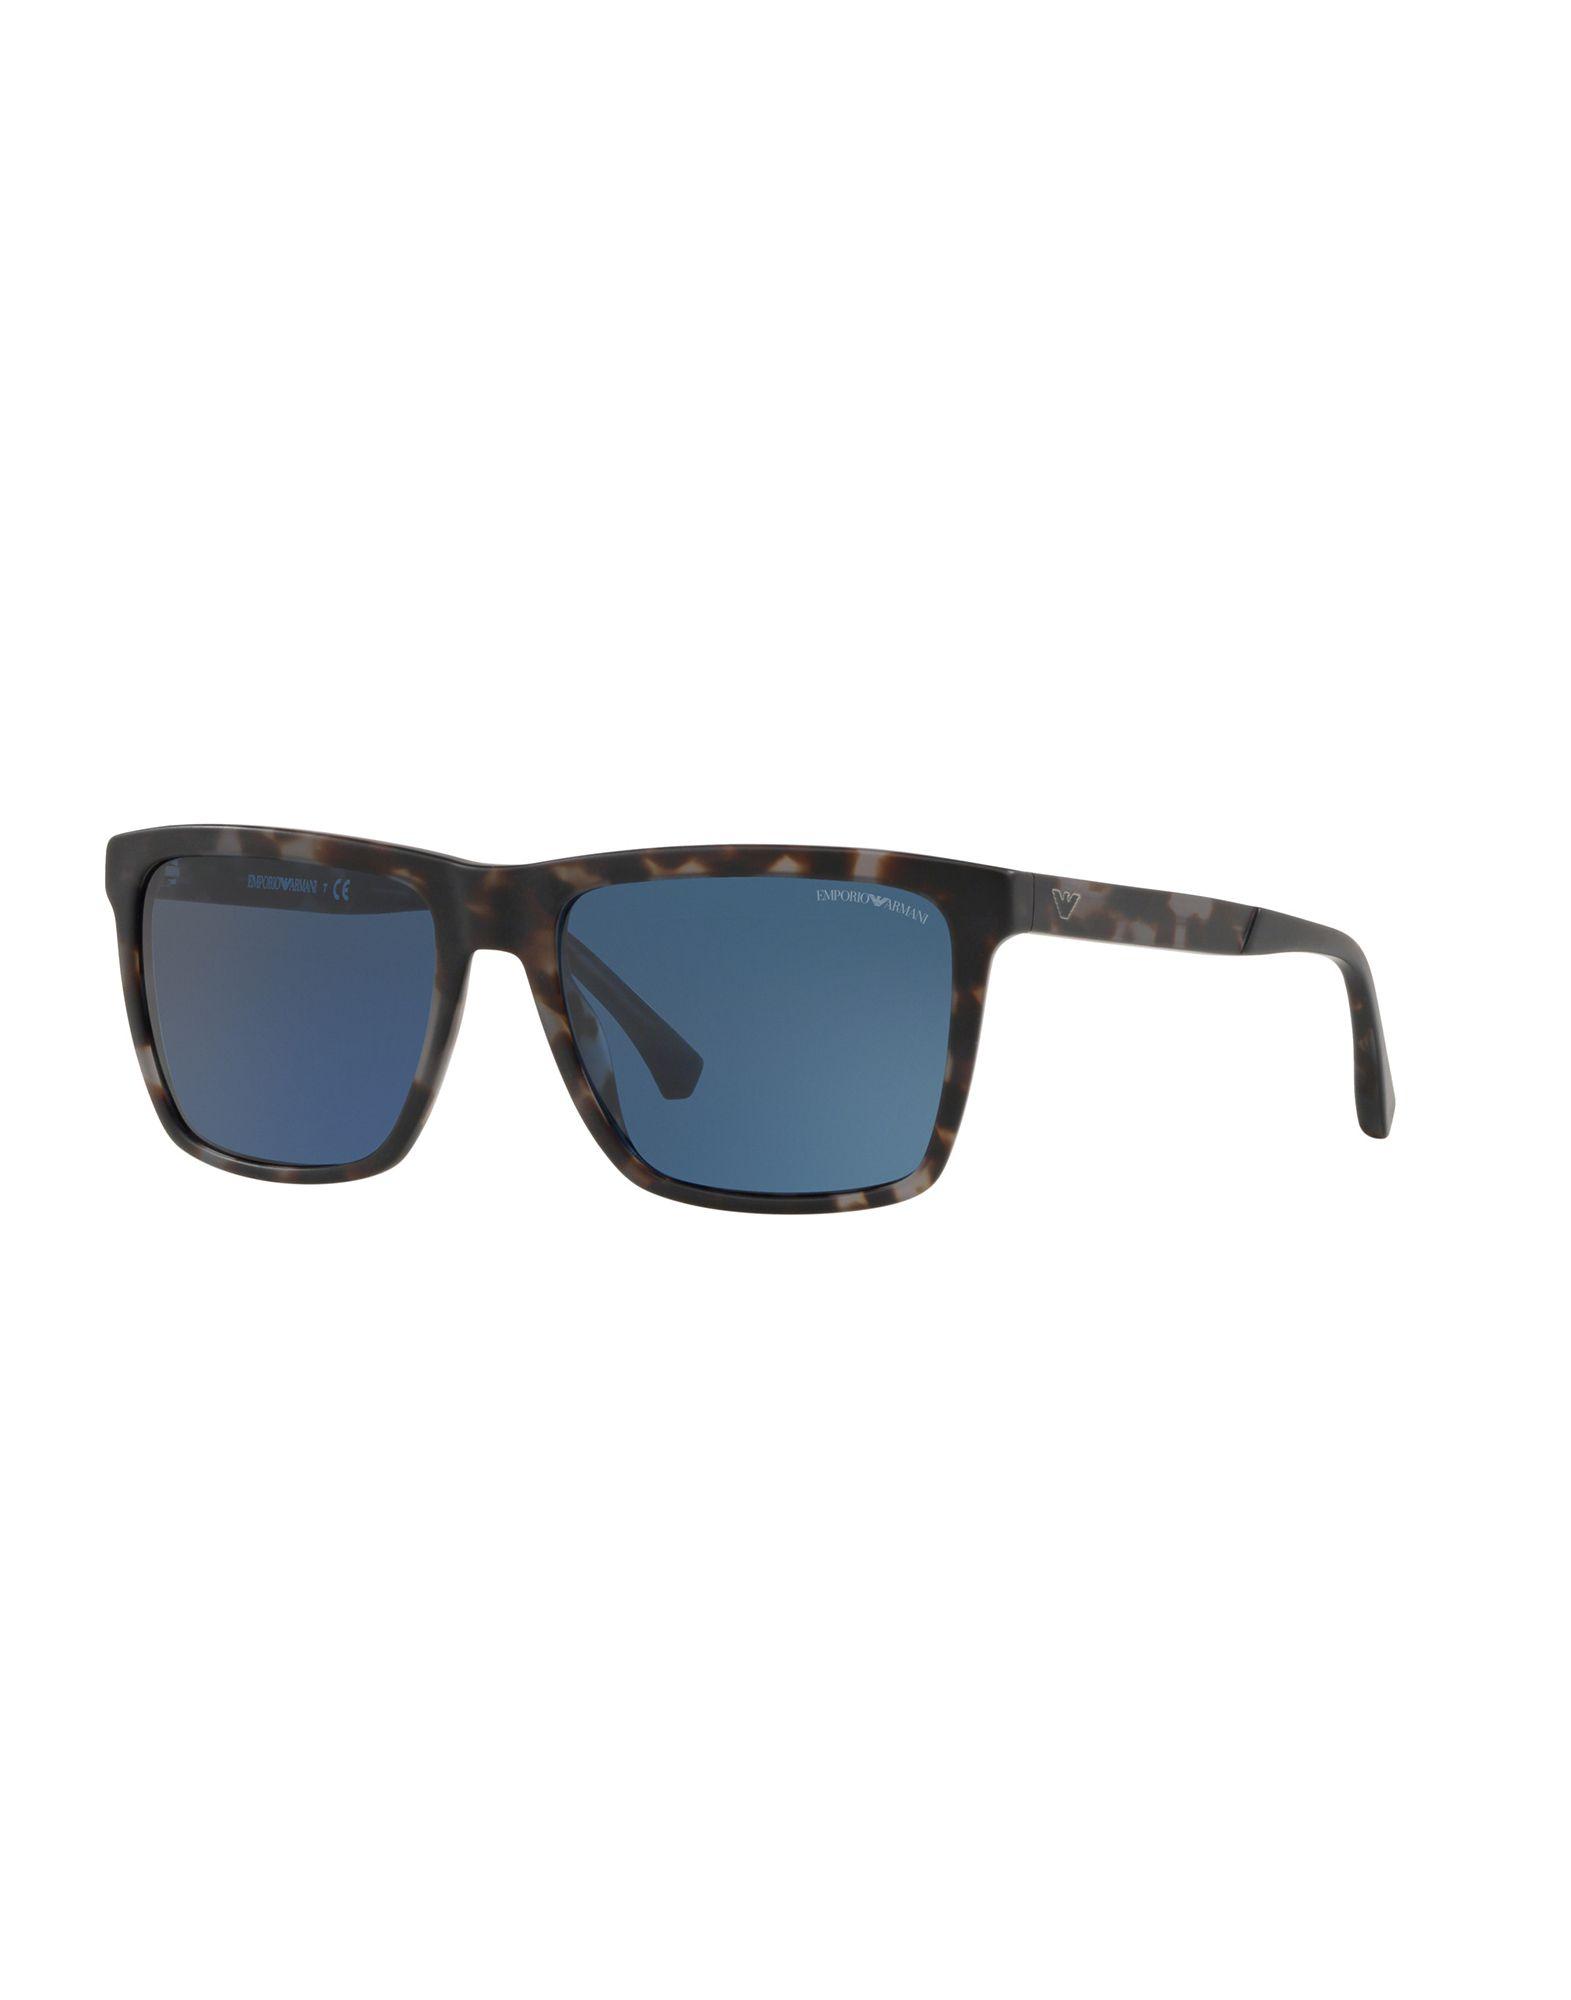 EMPORIO ARMANI Солнечные очки очки emporio armani очки